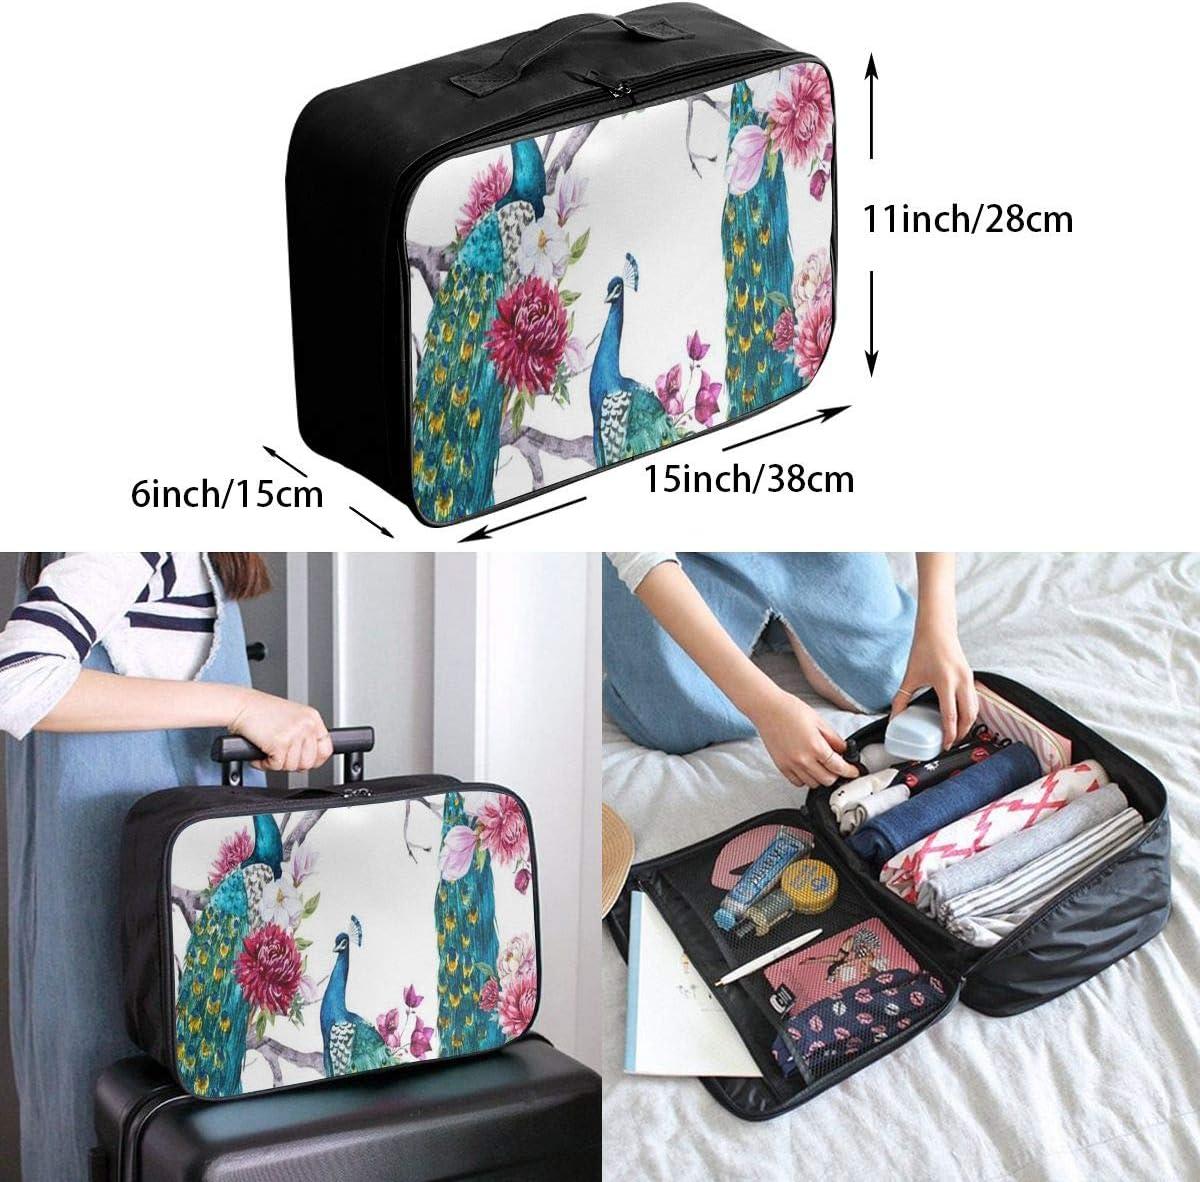 Travel Bags Peacock Sitting Tree Pink Flower Chrysanthemum Flower Pink Peony Portable Suitcase Trolley Handle Luggage Bag